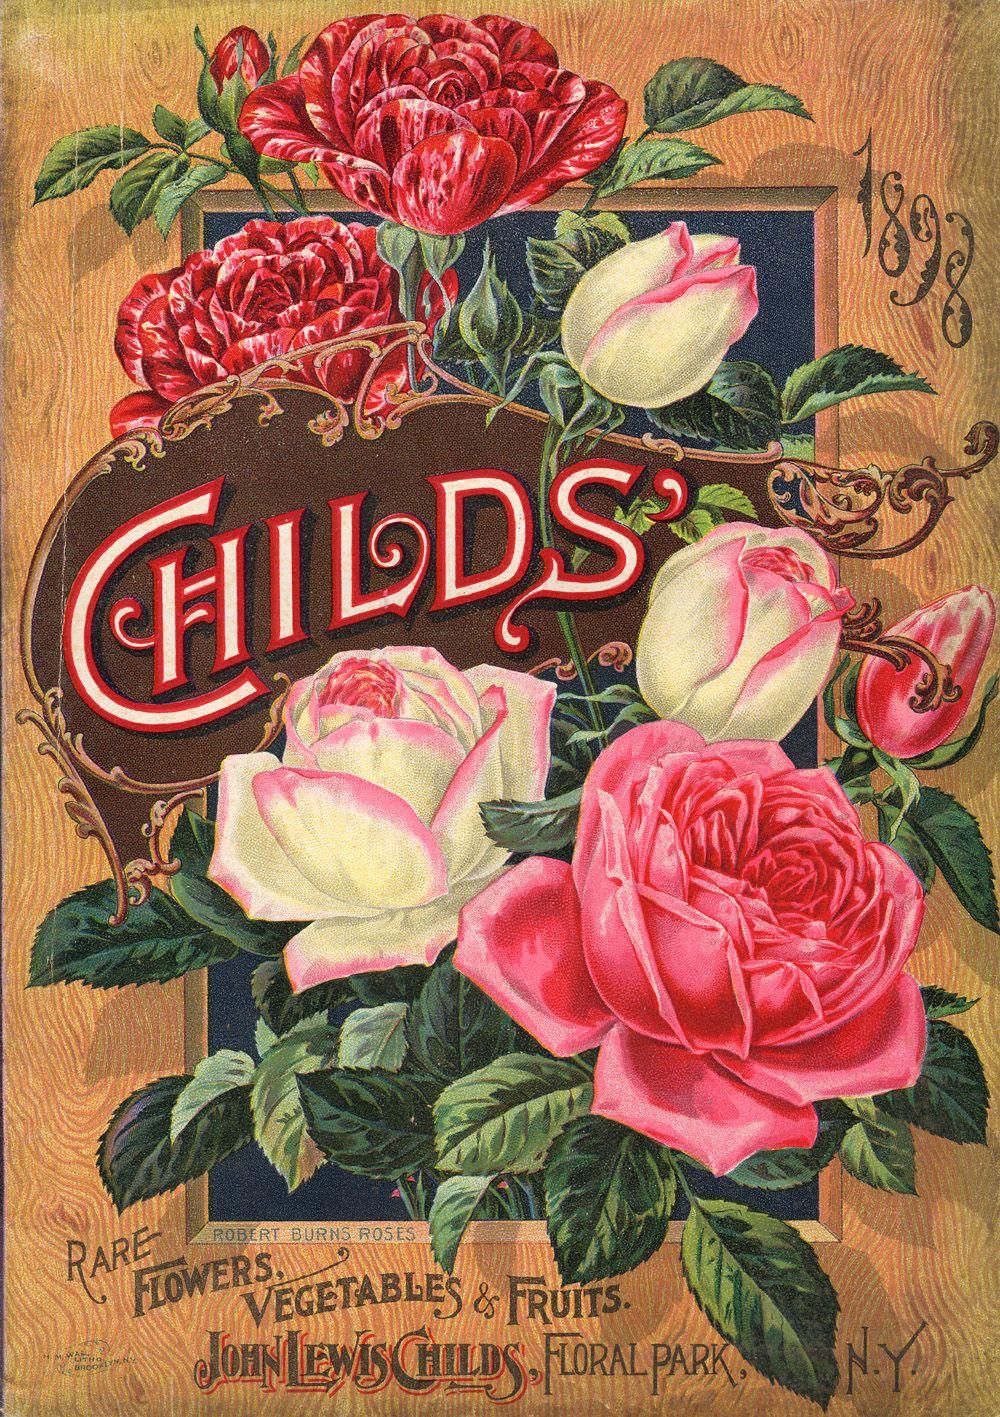 Childs' Rare Flowers, Vegetables & Fruits seed & nursery